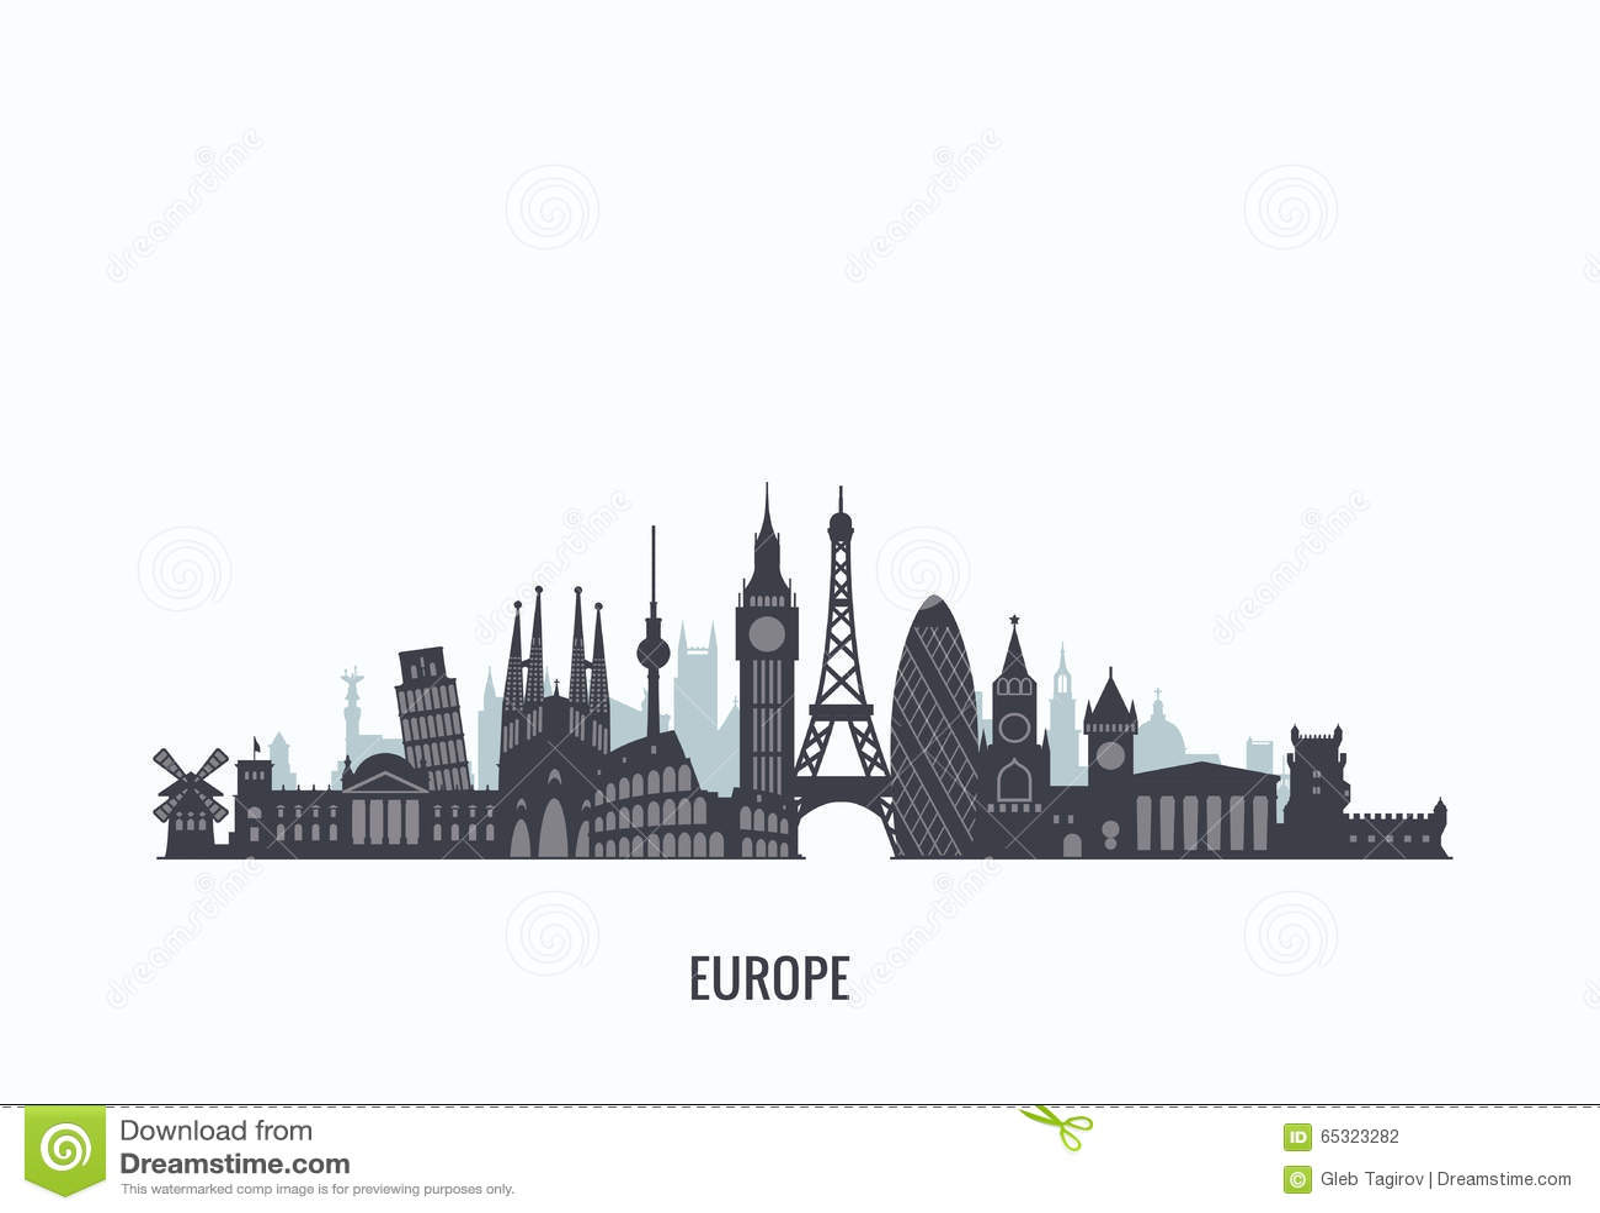 Europe Skyline Silhouette. Stock Vector - Image: 65323282